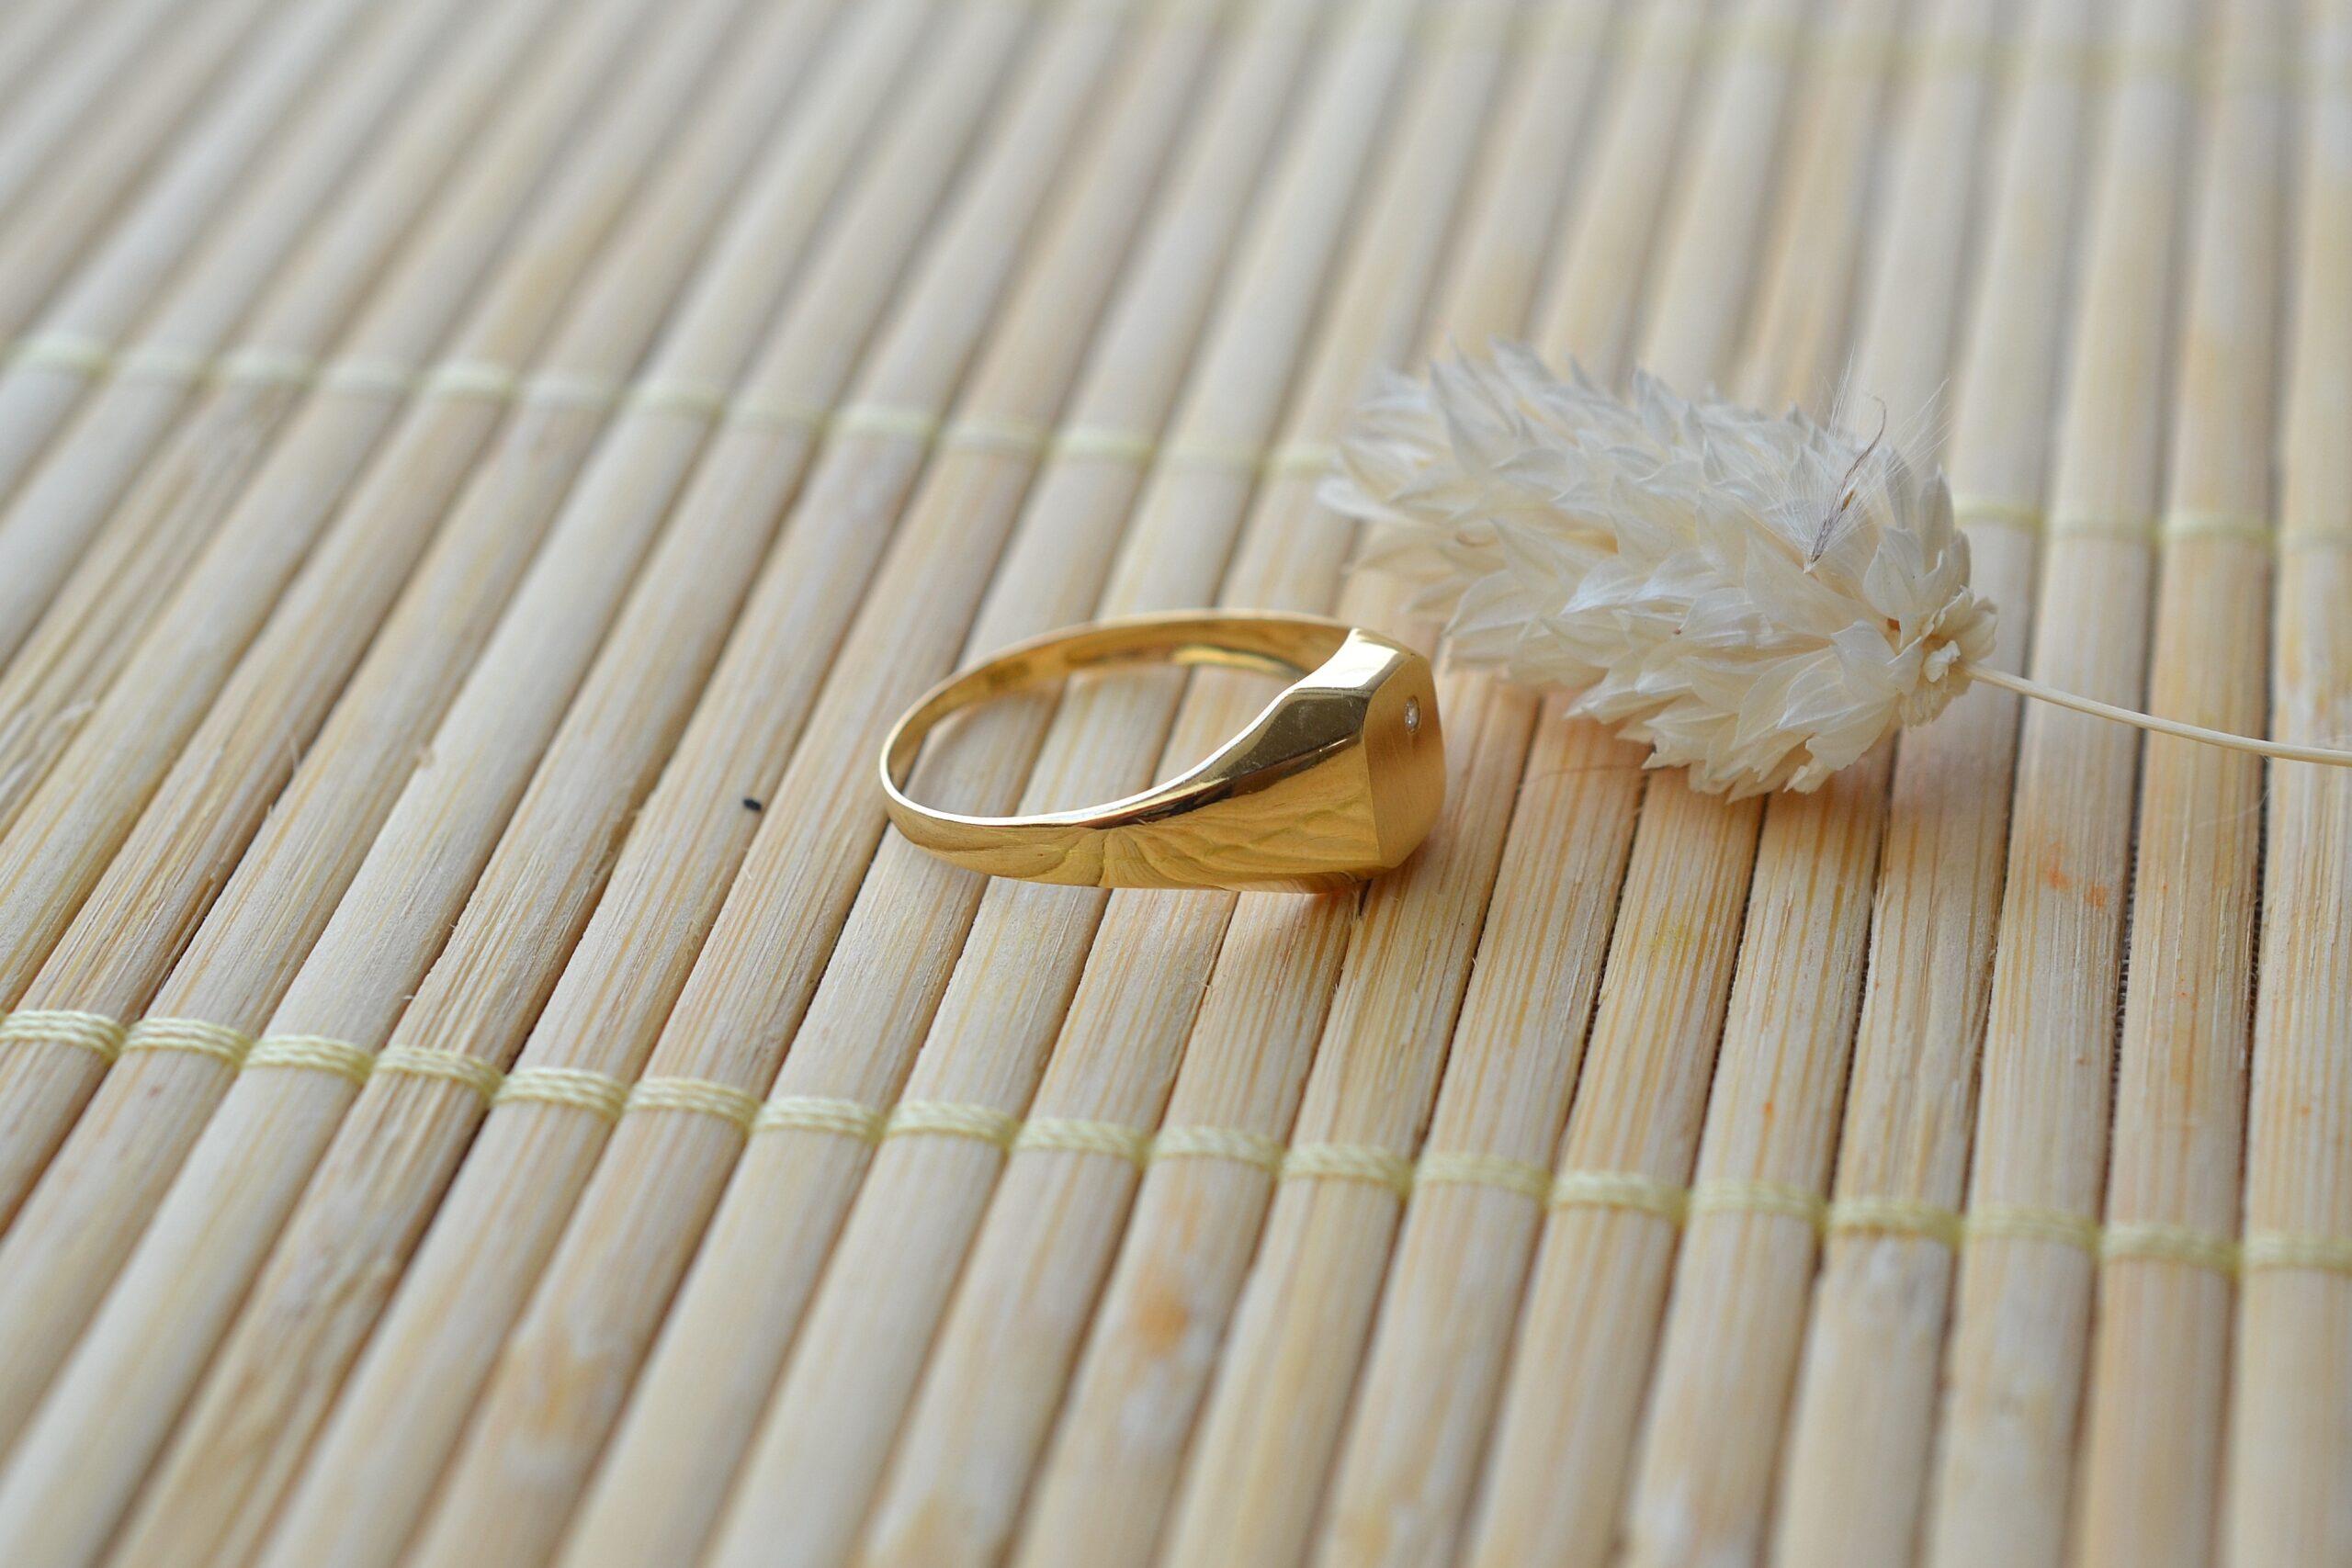 Bague chevaliere pierre blanche bijou en or jaune 18k